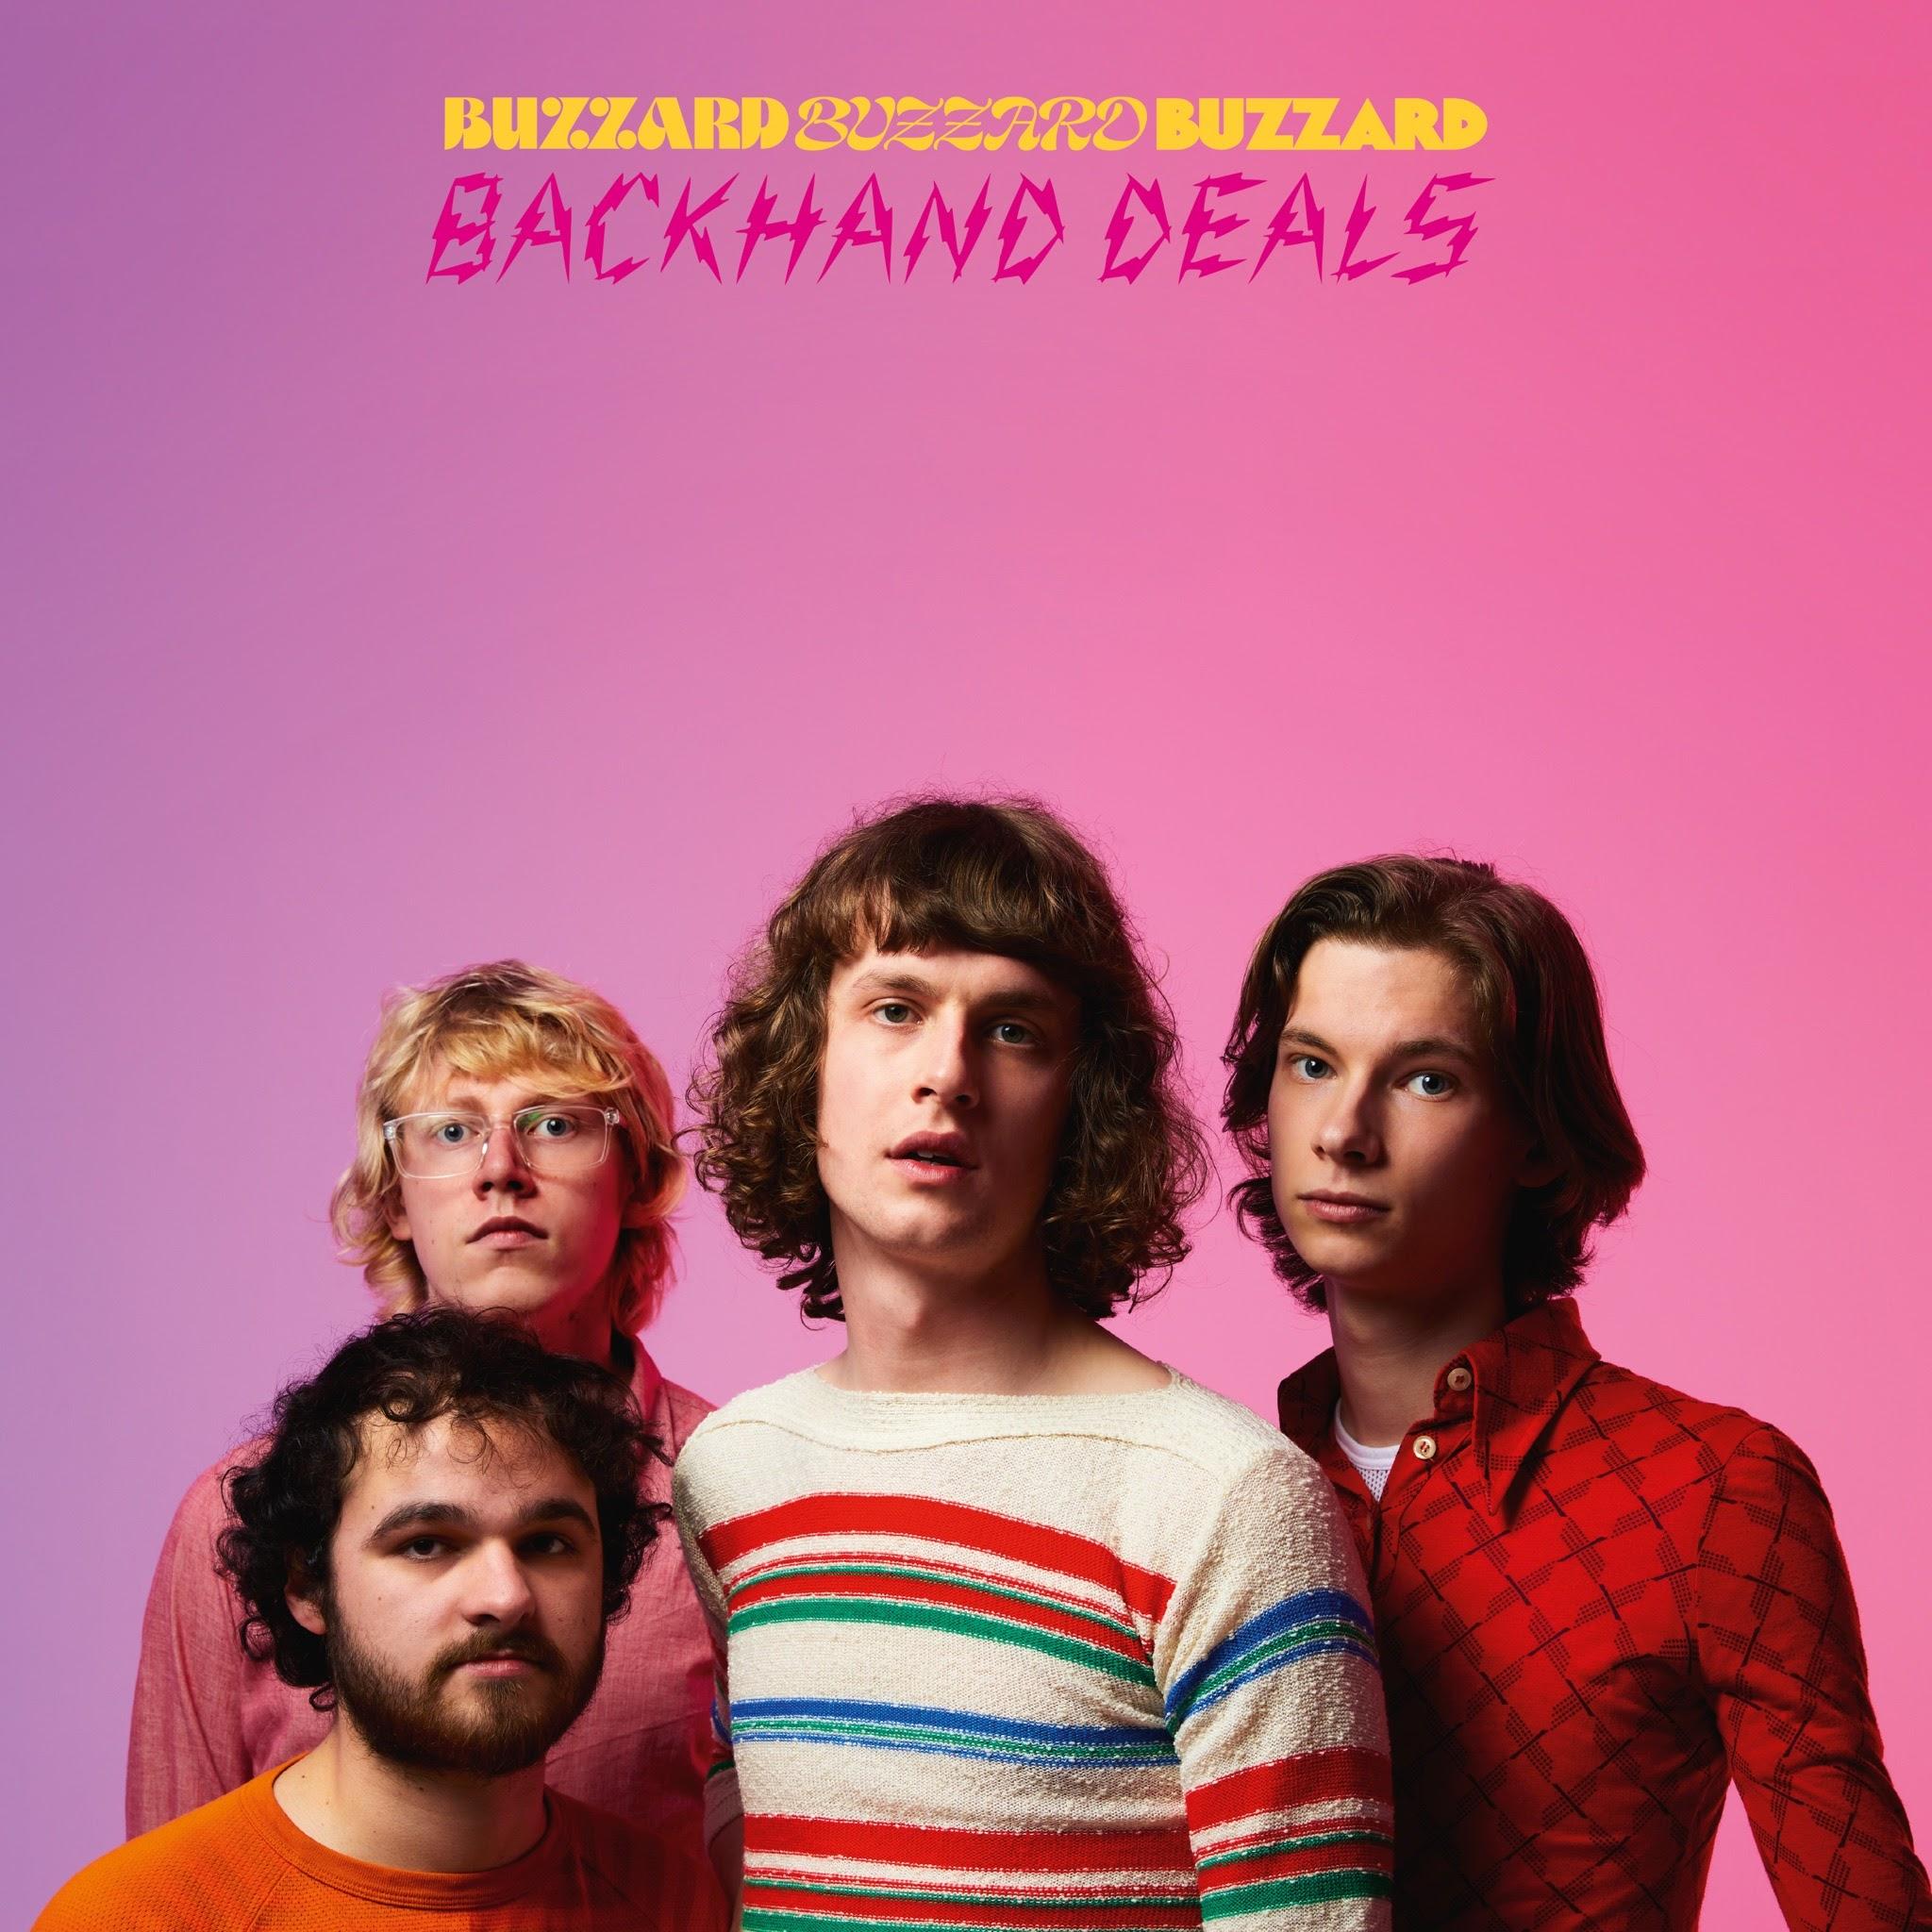 Buzzard album